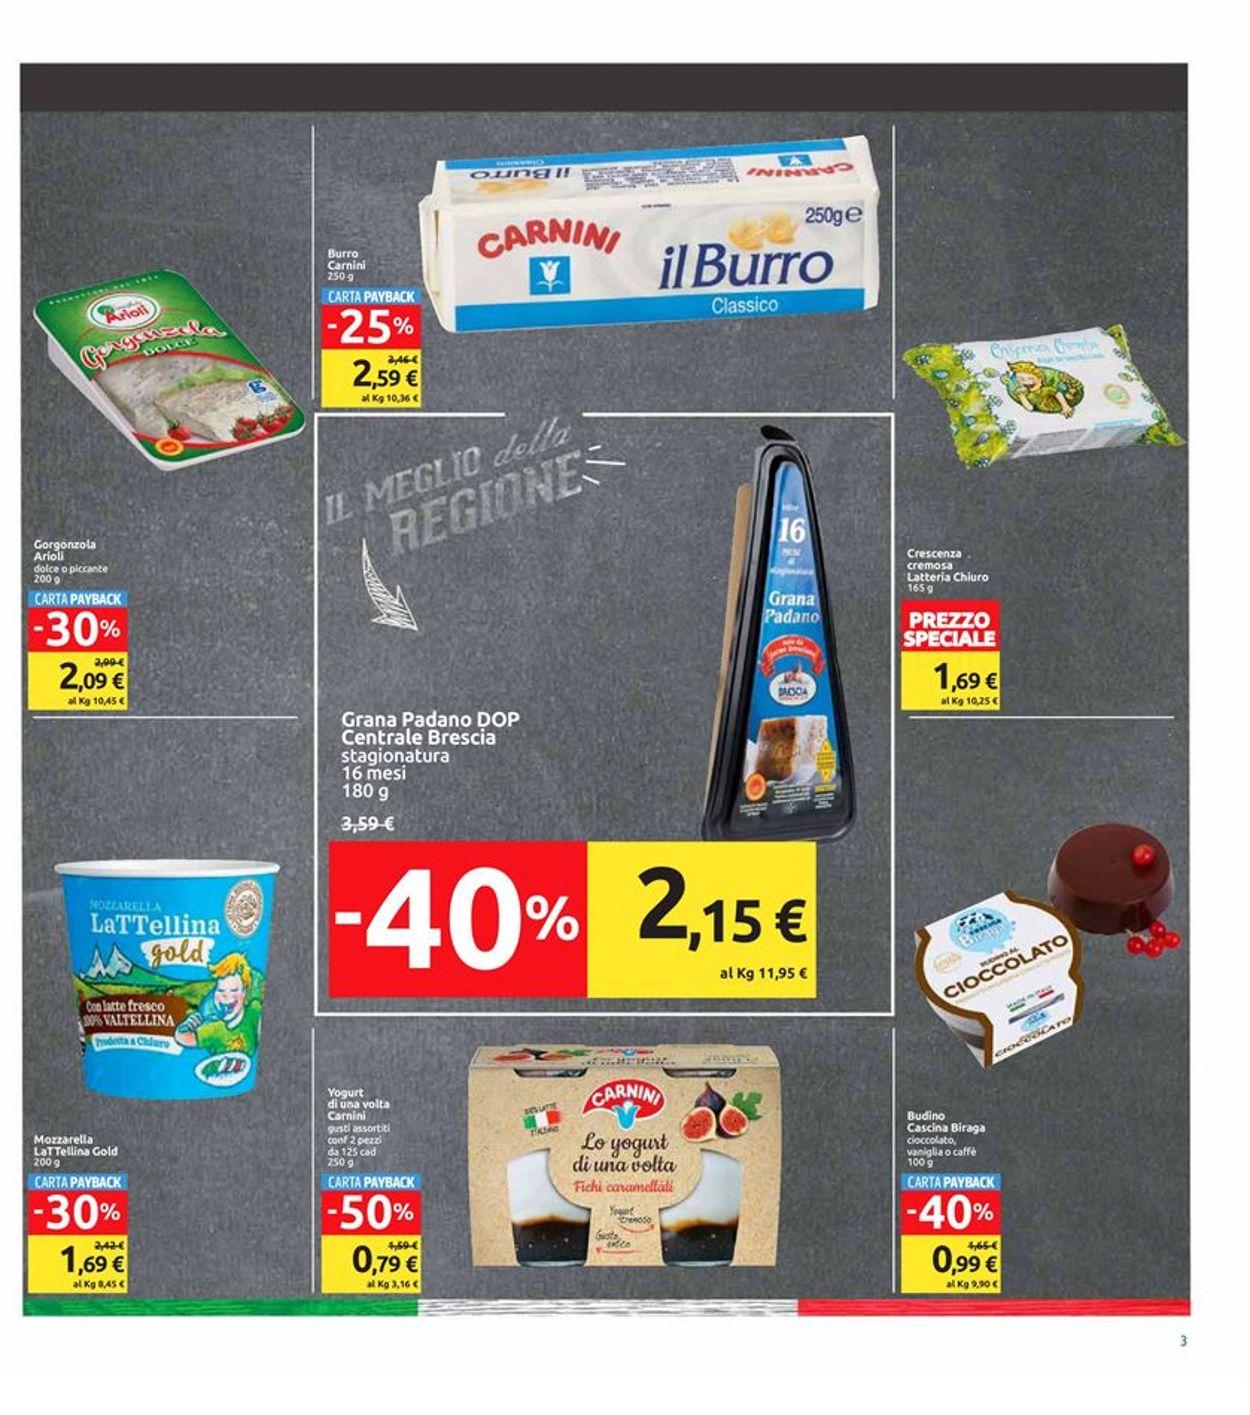 Volantino Carrefour - Offerte 09/08-28/08/2019 (Pagina 3)